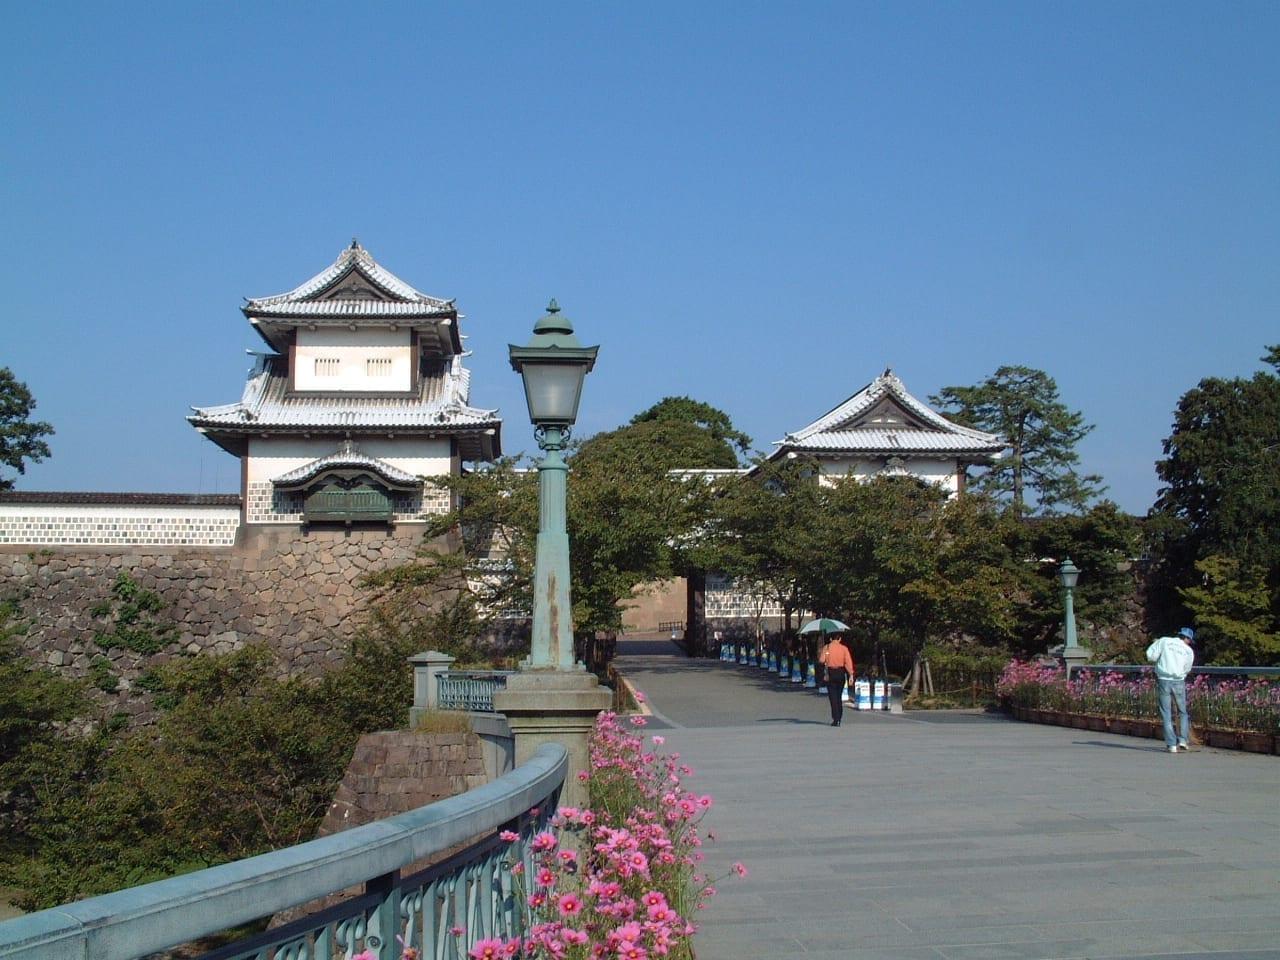 Puerta de Ishikawa, Castillo de Kanazawa Kanazawa Japón